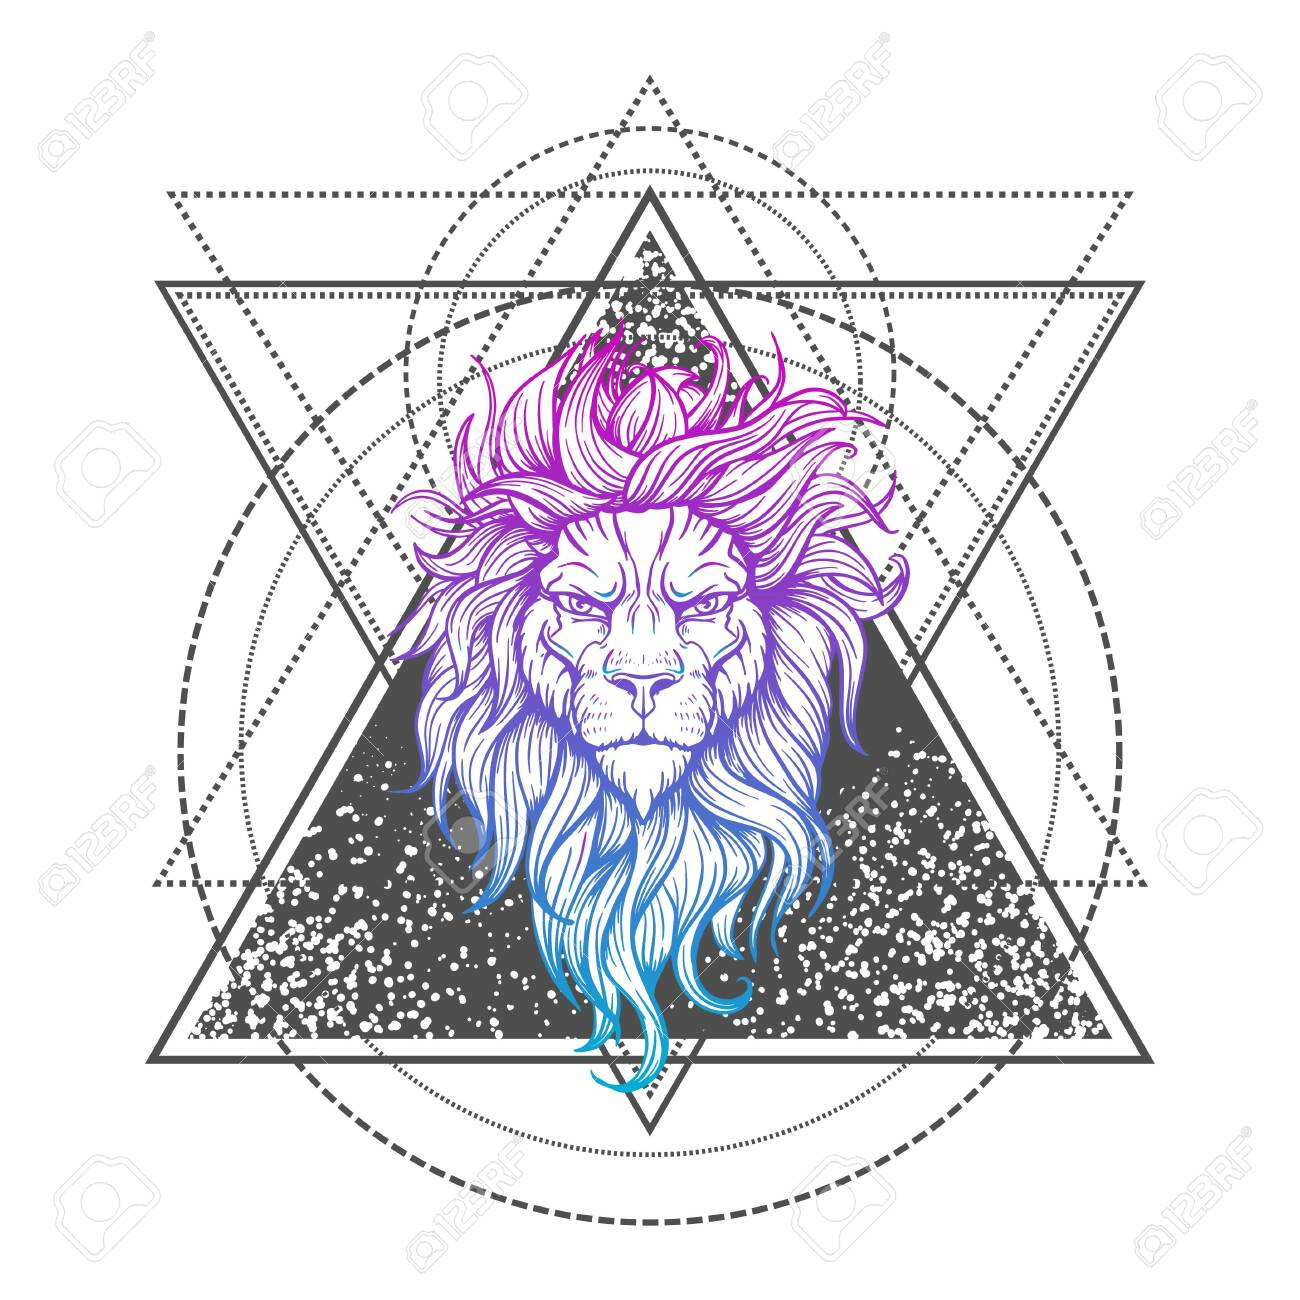 Vector Tattoo Lion. Illustration on geometry sign - 132919762